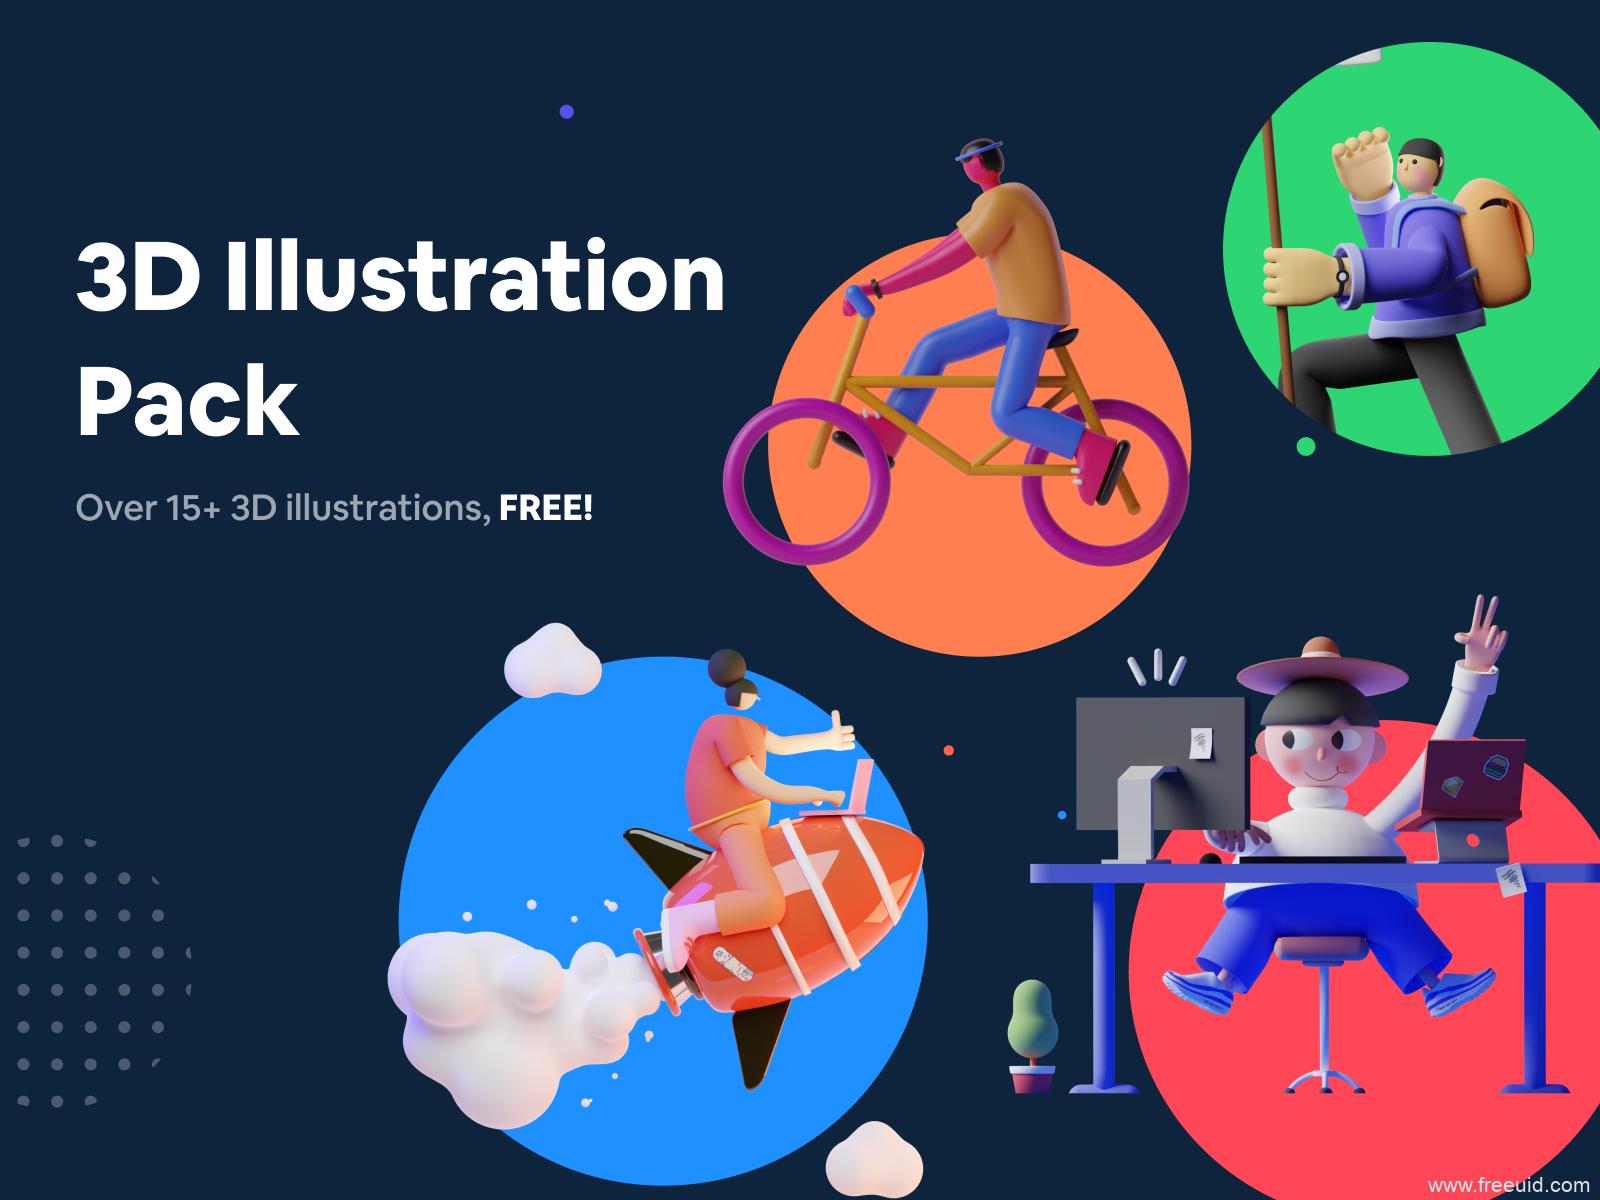 3D插画素材资源,C4D插画风人物插画组件UI kit下载,3D运营插画figma源文件下载